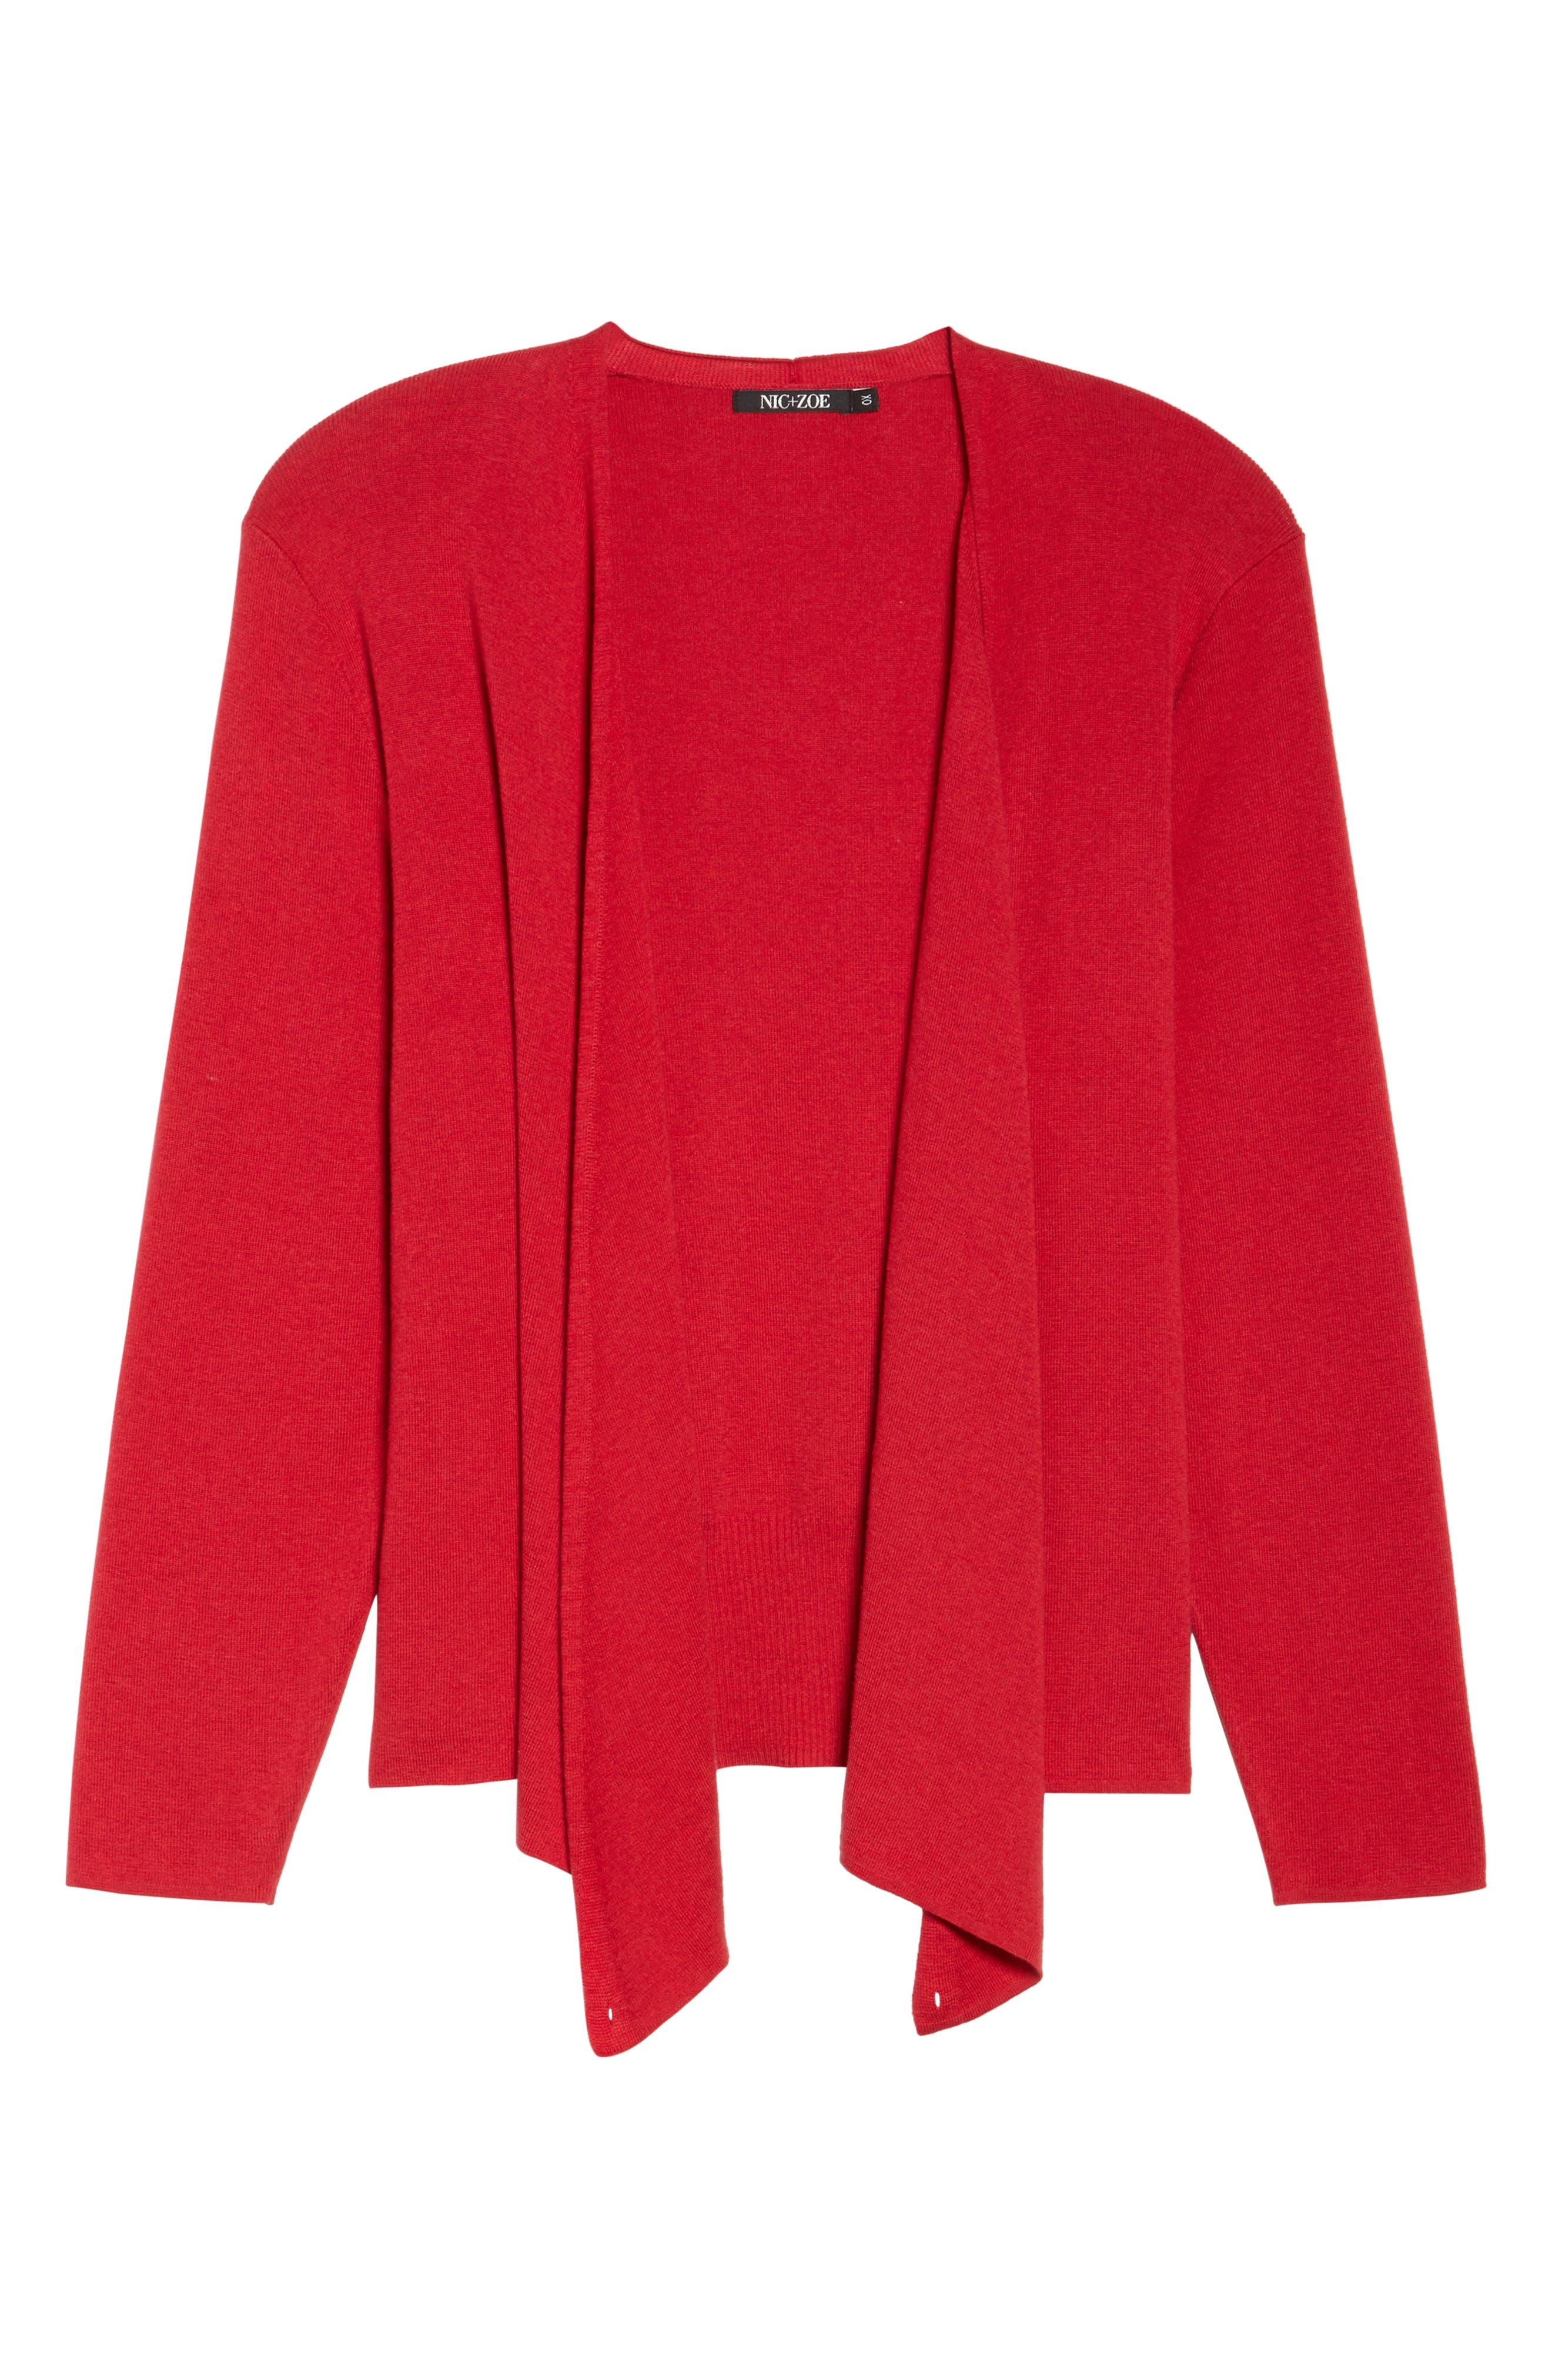 4-Way Convertible Cardigan,                             Alternate thumbnail 6, color,                             True Red